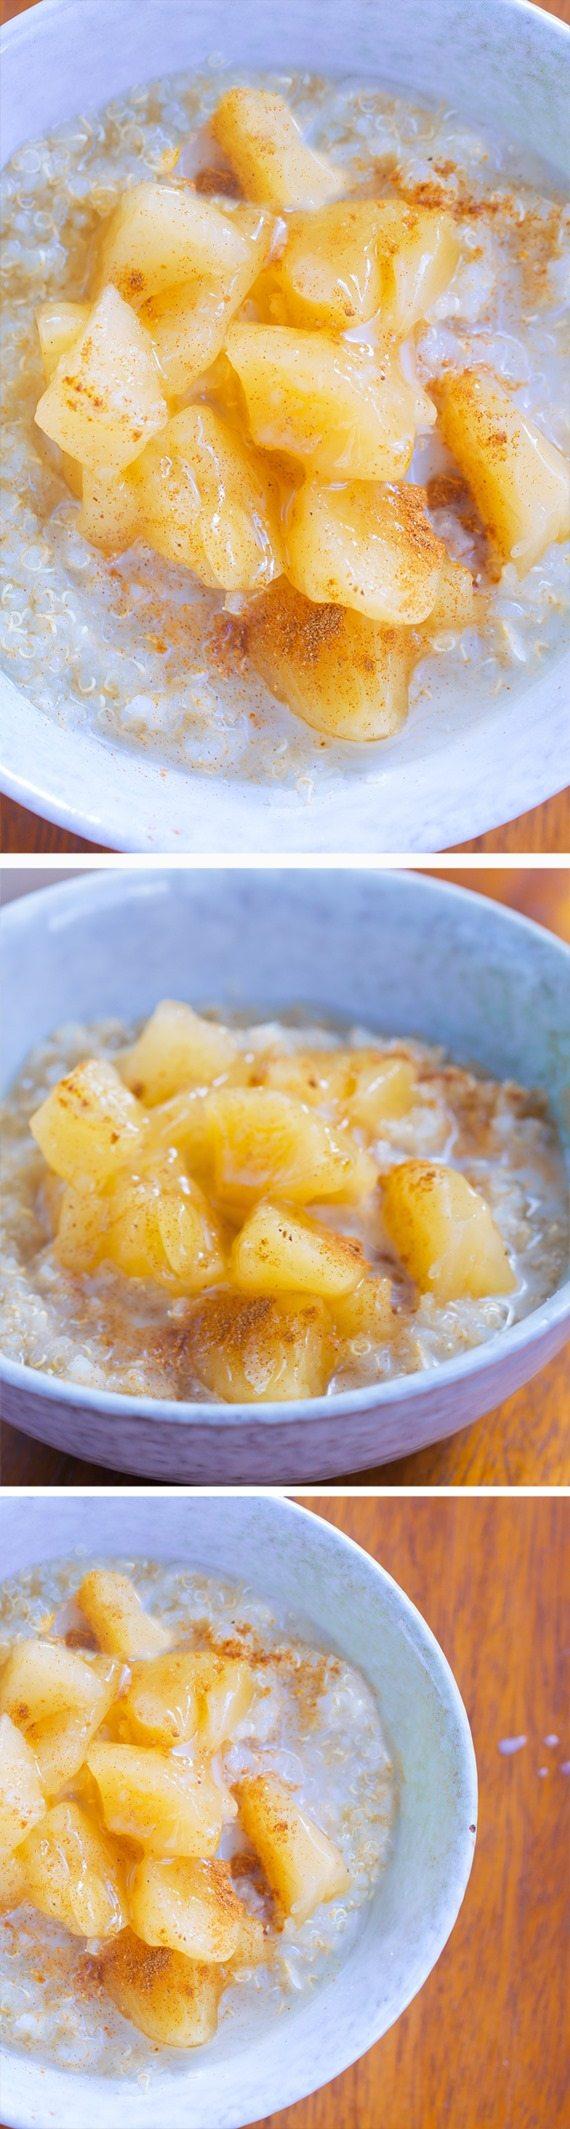 Apple Pie Breakfast Quinoa – from @choccoveredkt… 1/2 cup quinoa, 1/2 tsp cinnamon, 1 large apple, 1/4 tsp vanilla extract… Full recipe: https://chocolatecoveredkatie.com/2015/11/09/apple-quinoa-breakfast-bowls/